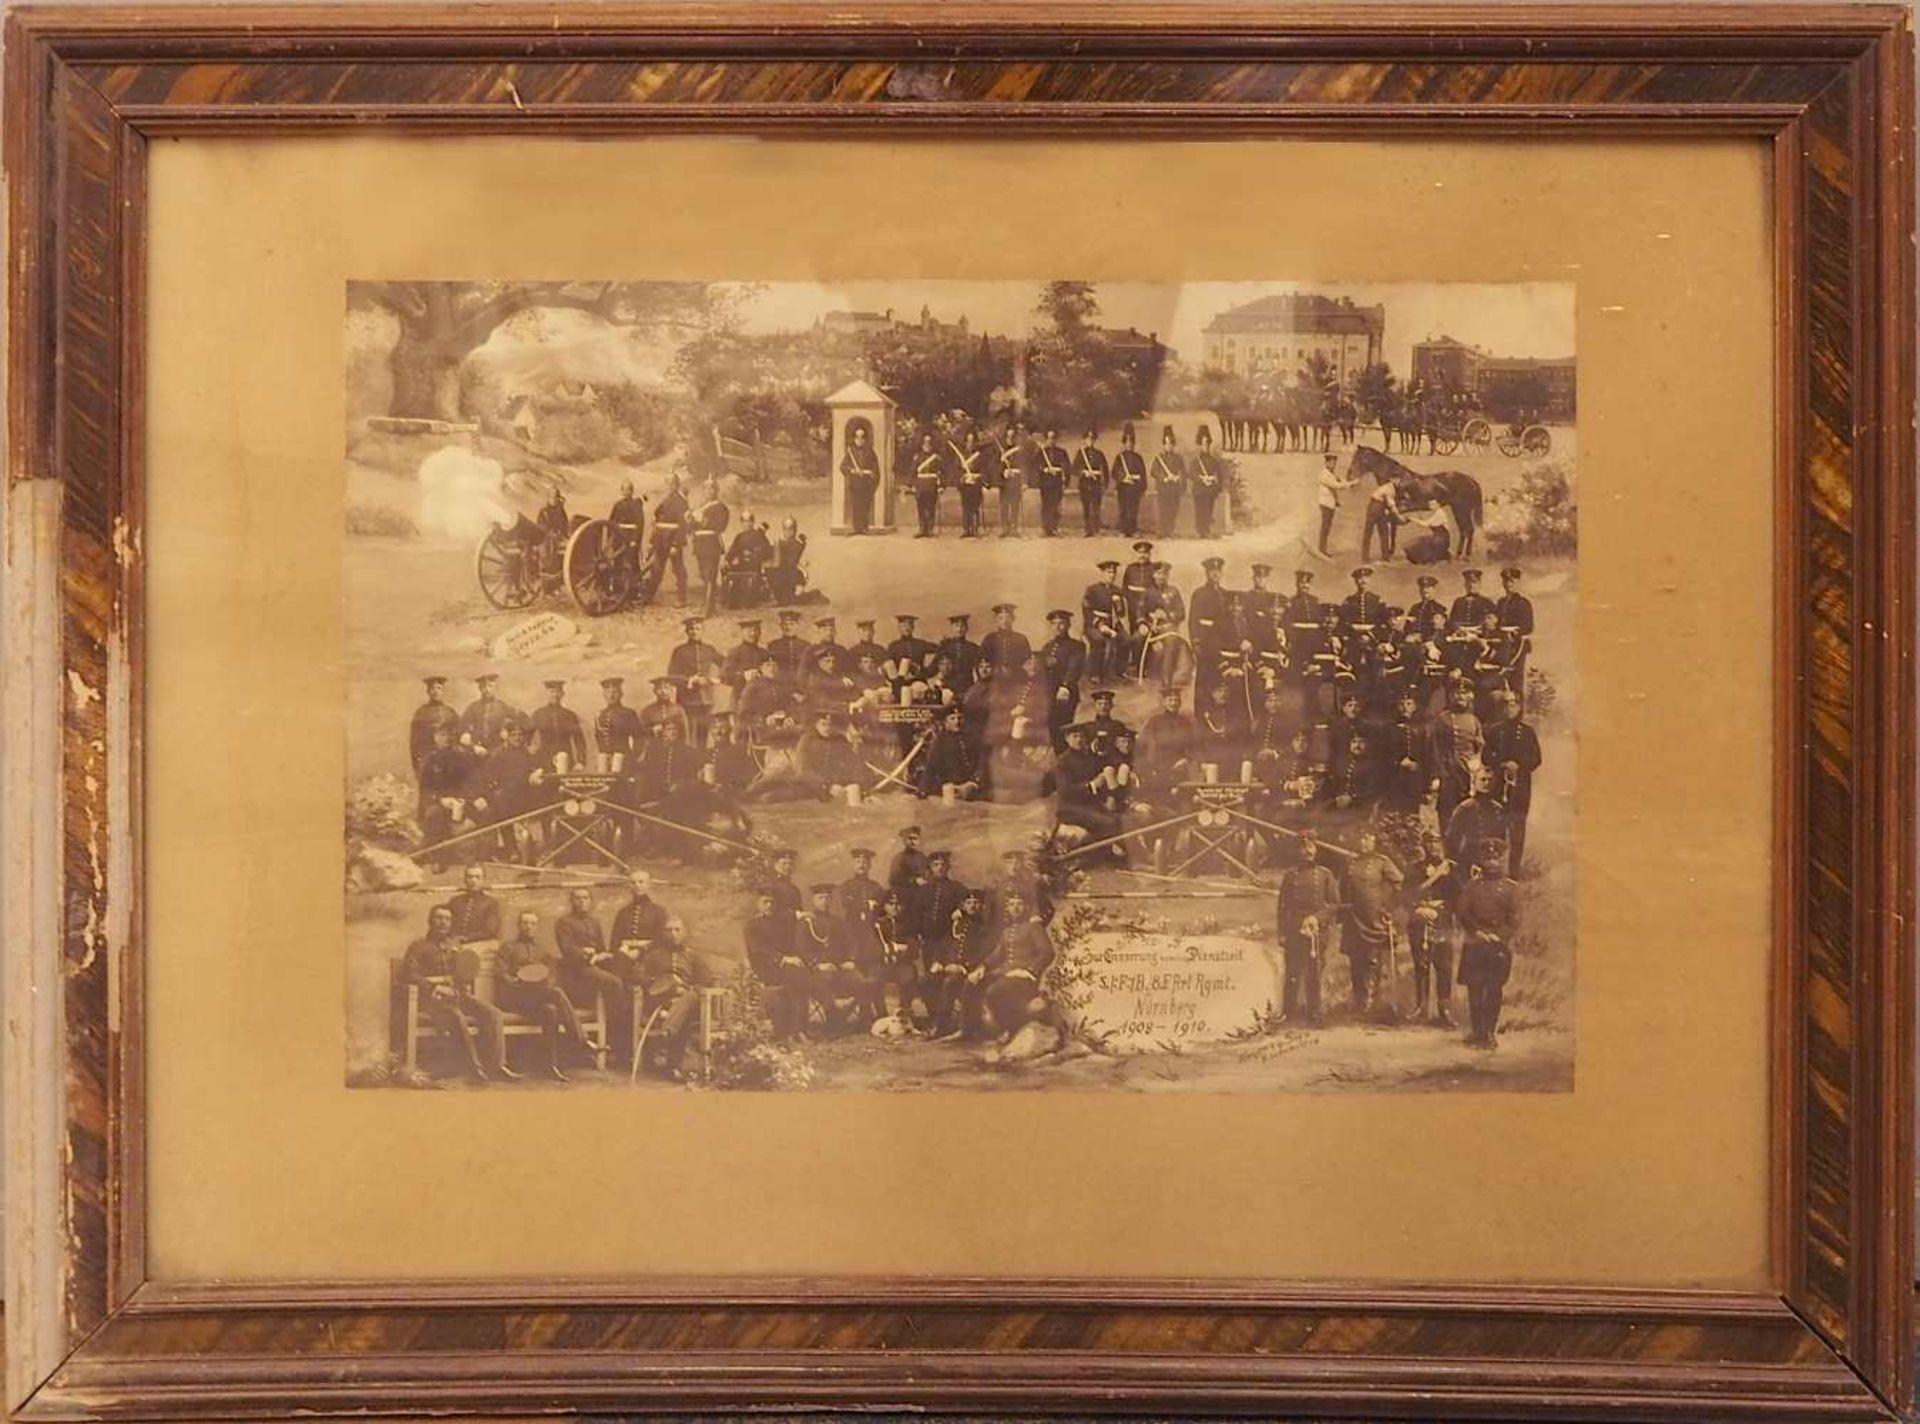 "1 Konv. Memorabilia 1. WK: 2 Fotografie-Kollagen: ""5./F/B.8.F.Art. Rgmt. Nürnberg 190 - Bild 2 aus 3"